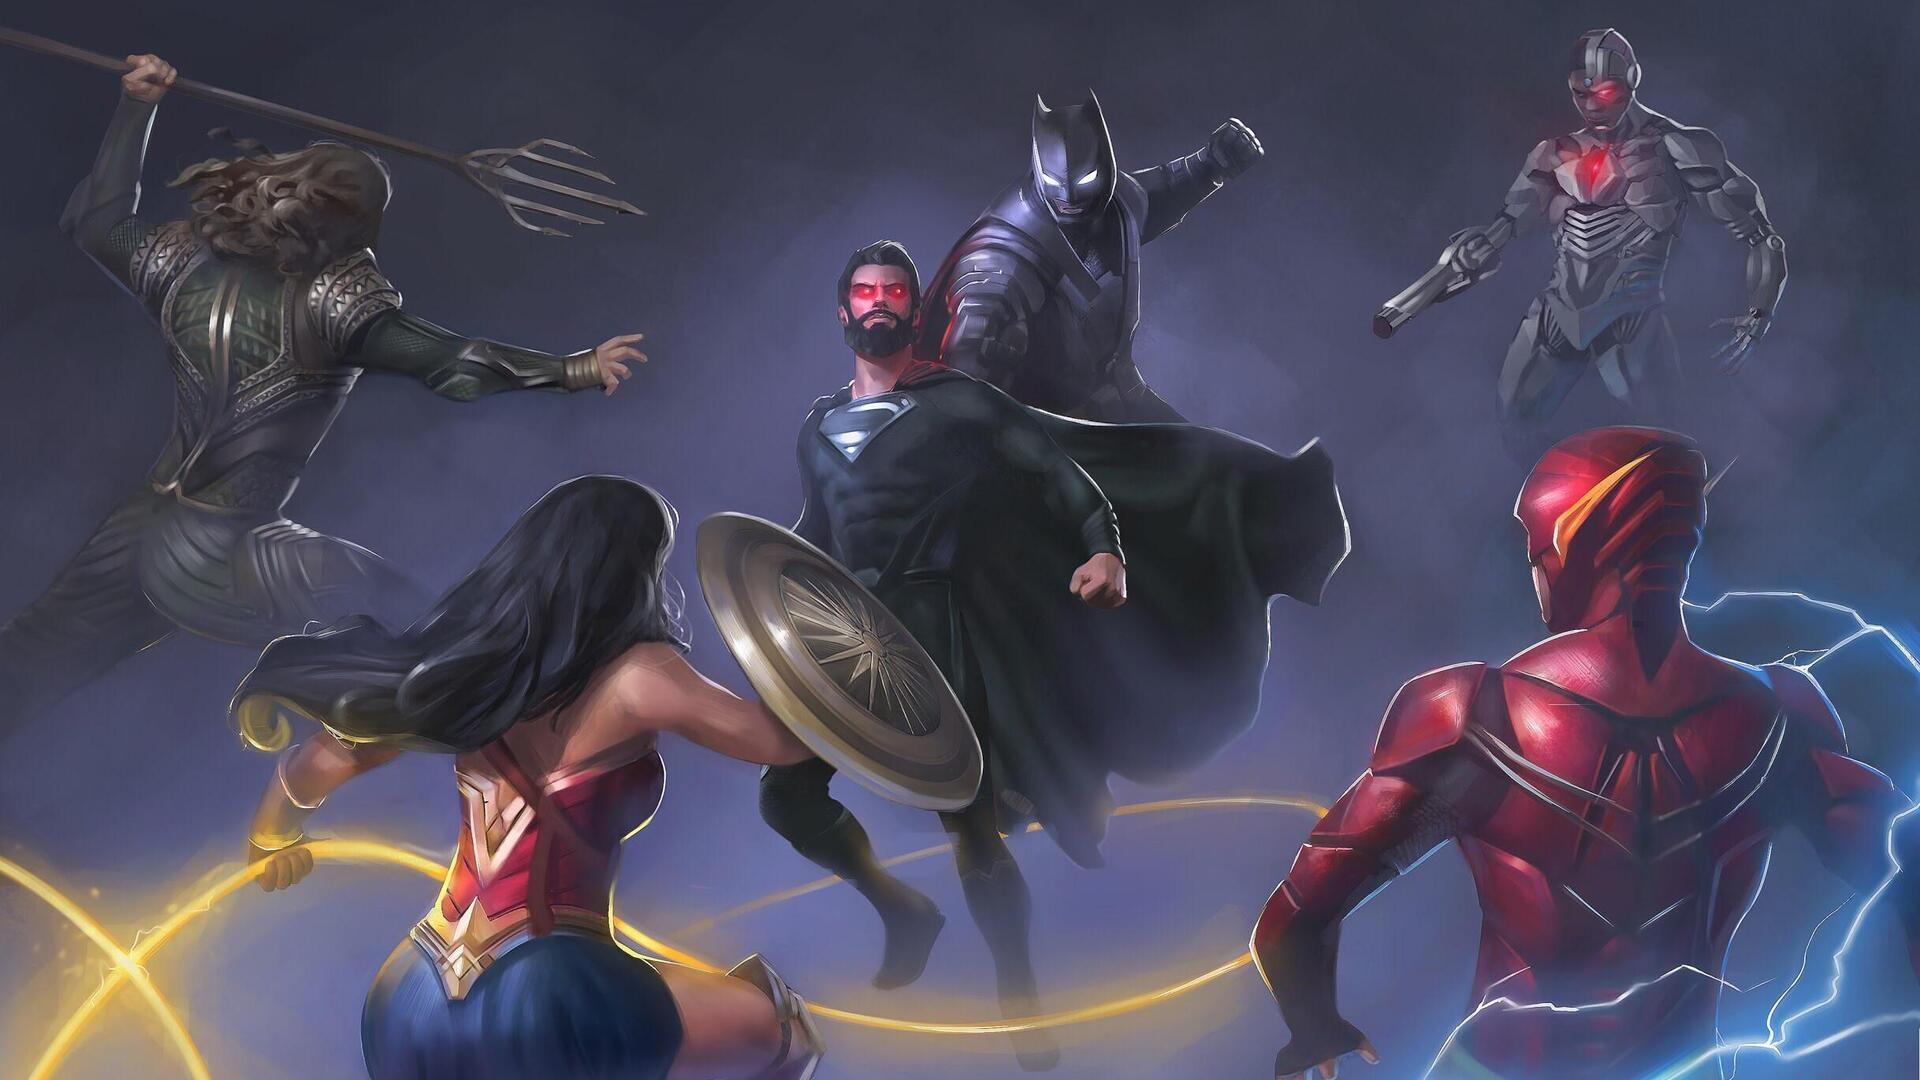 Justice League wallpaper hd